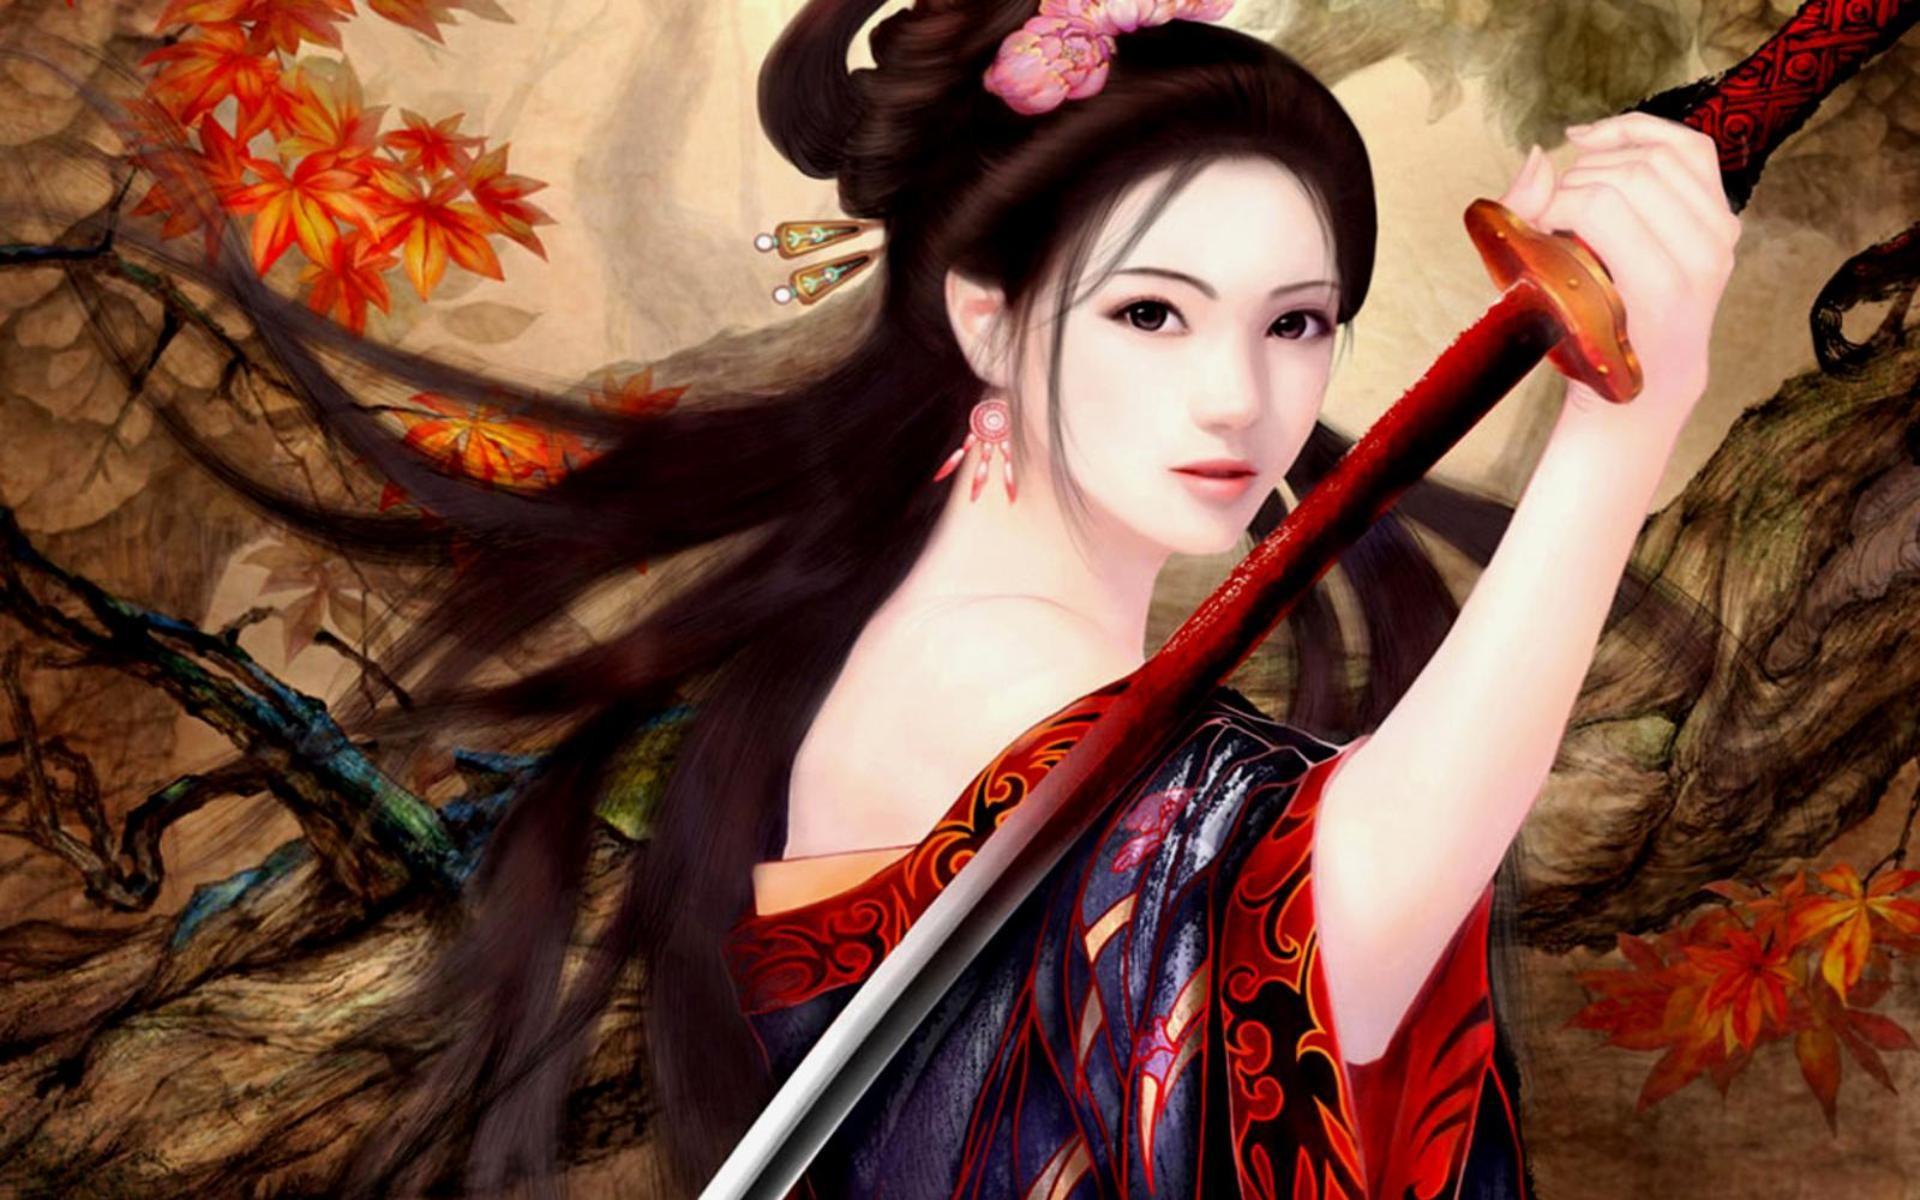 Anime Female Warrior Wallpaper Beautiful warrior